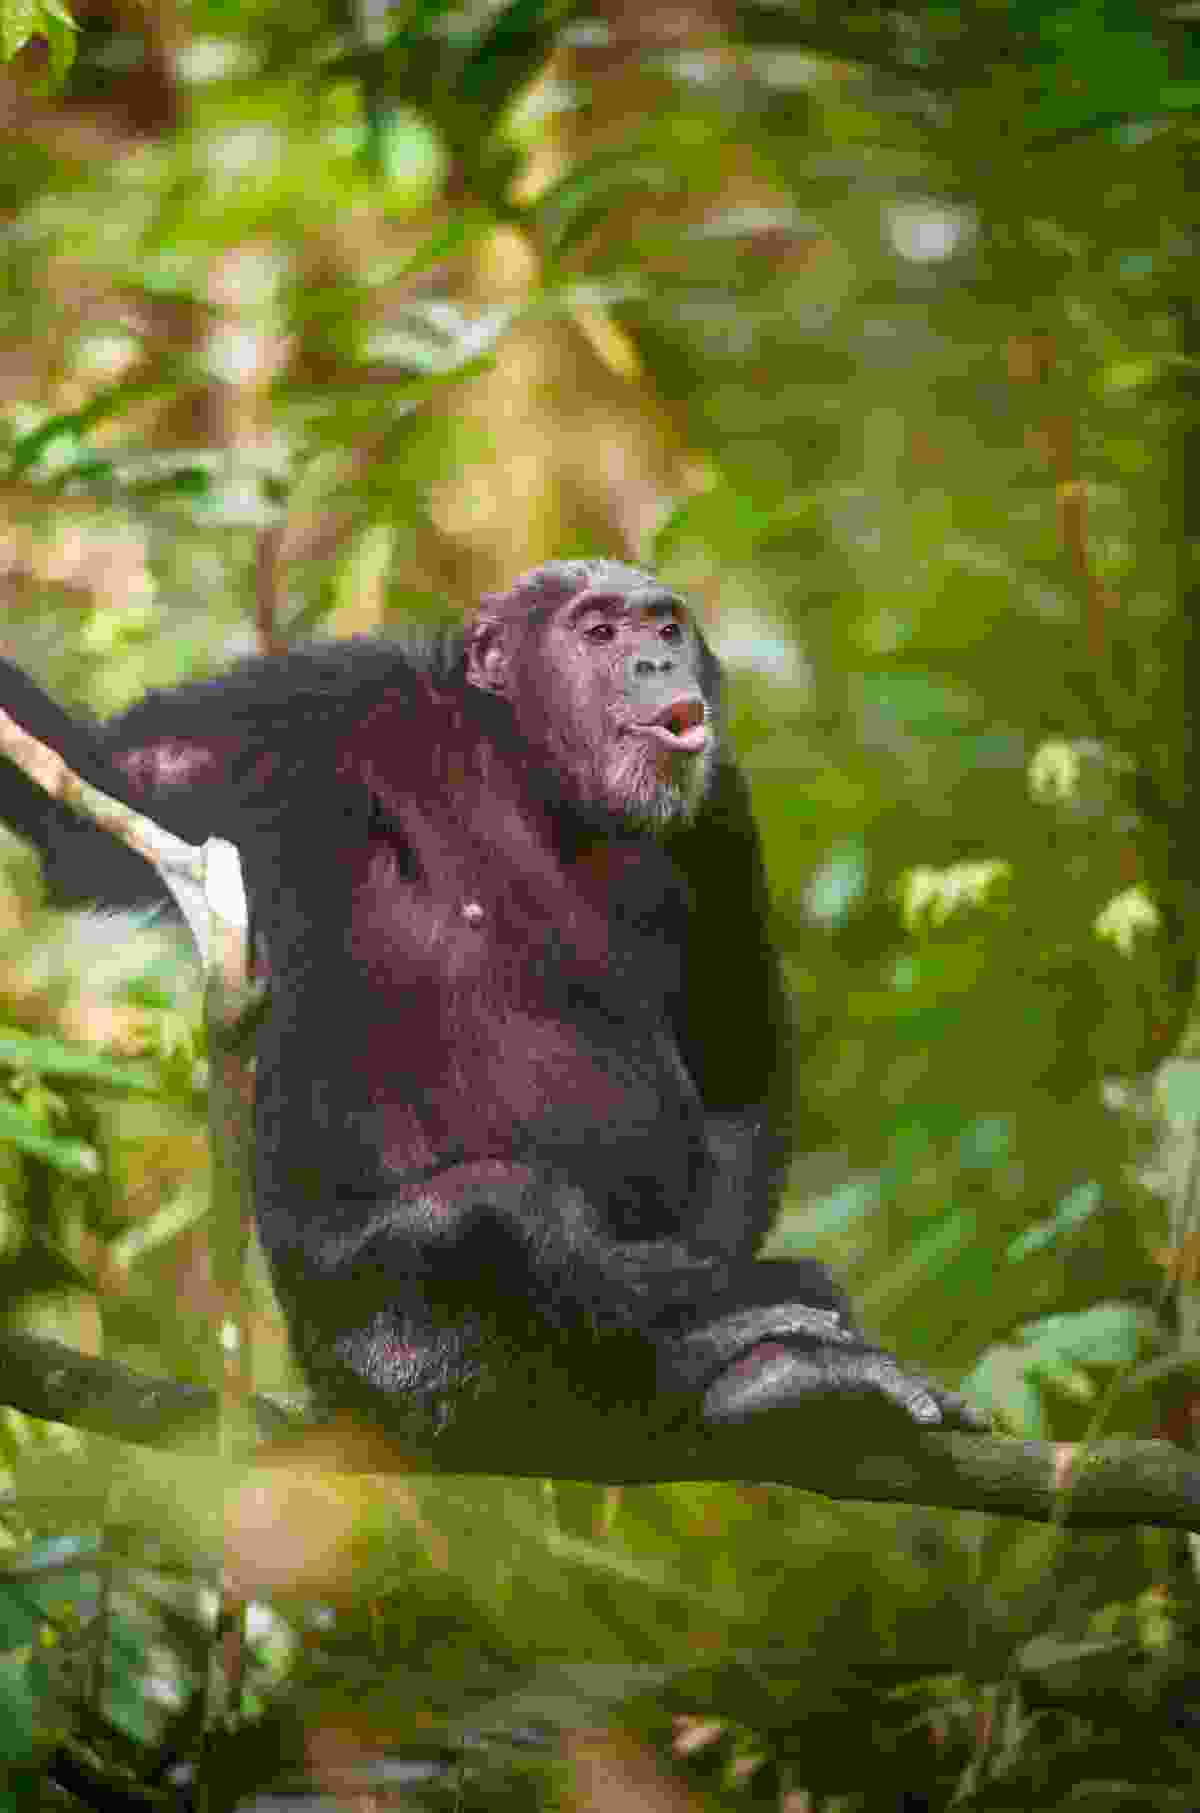 Chimpanzee, Mahale, Tanzania (Margot Raggett)